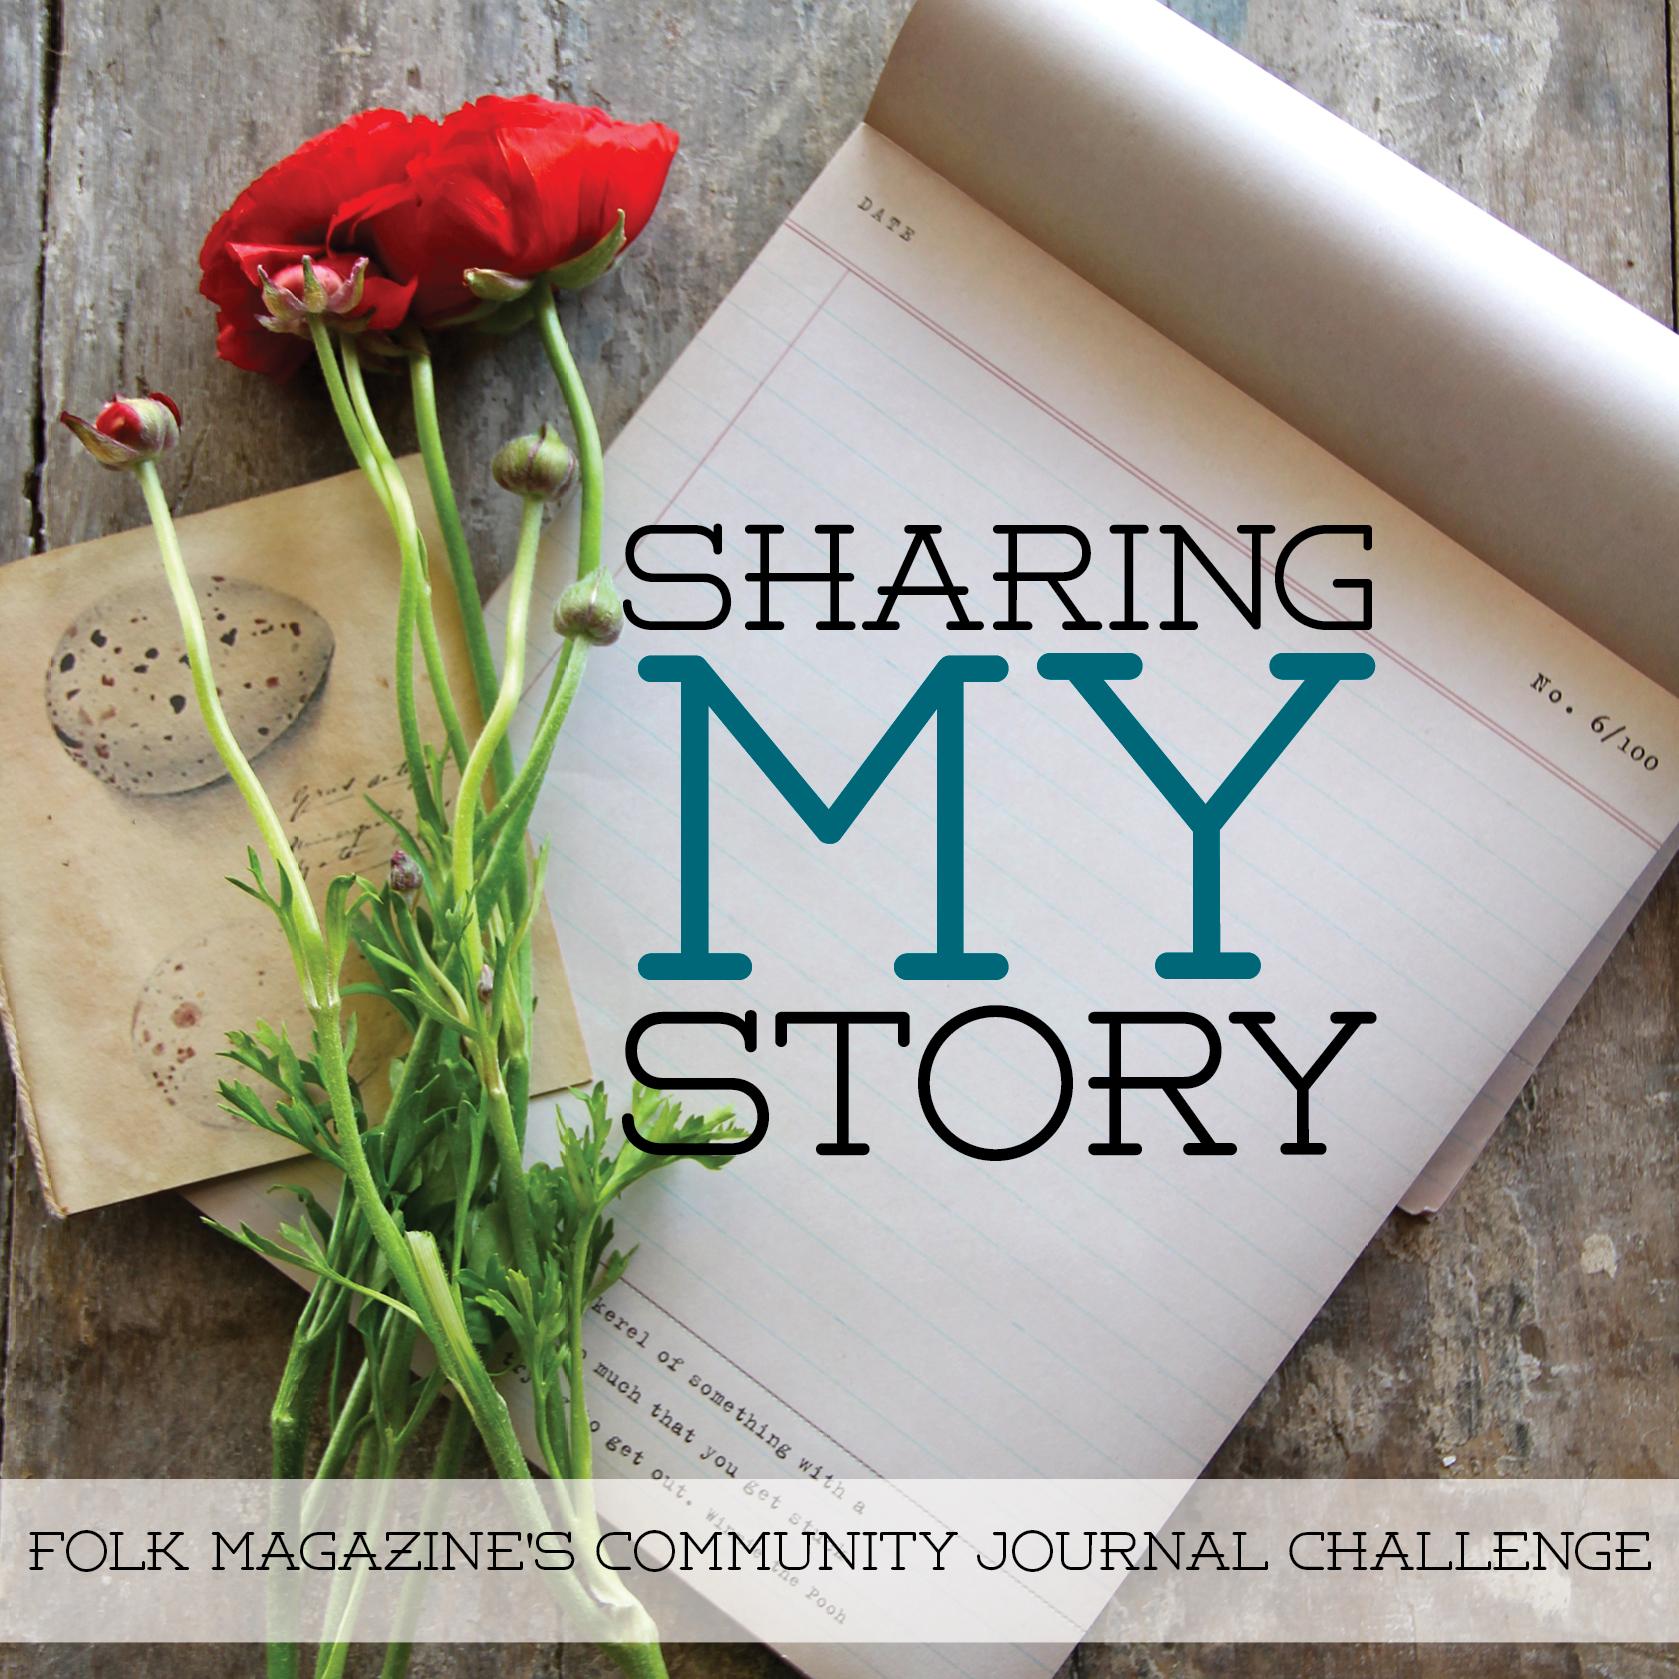 FOLK-sharemystory2